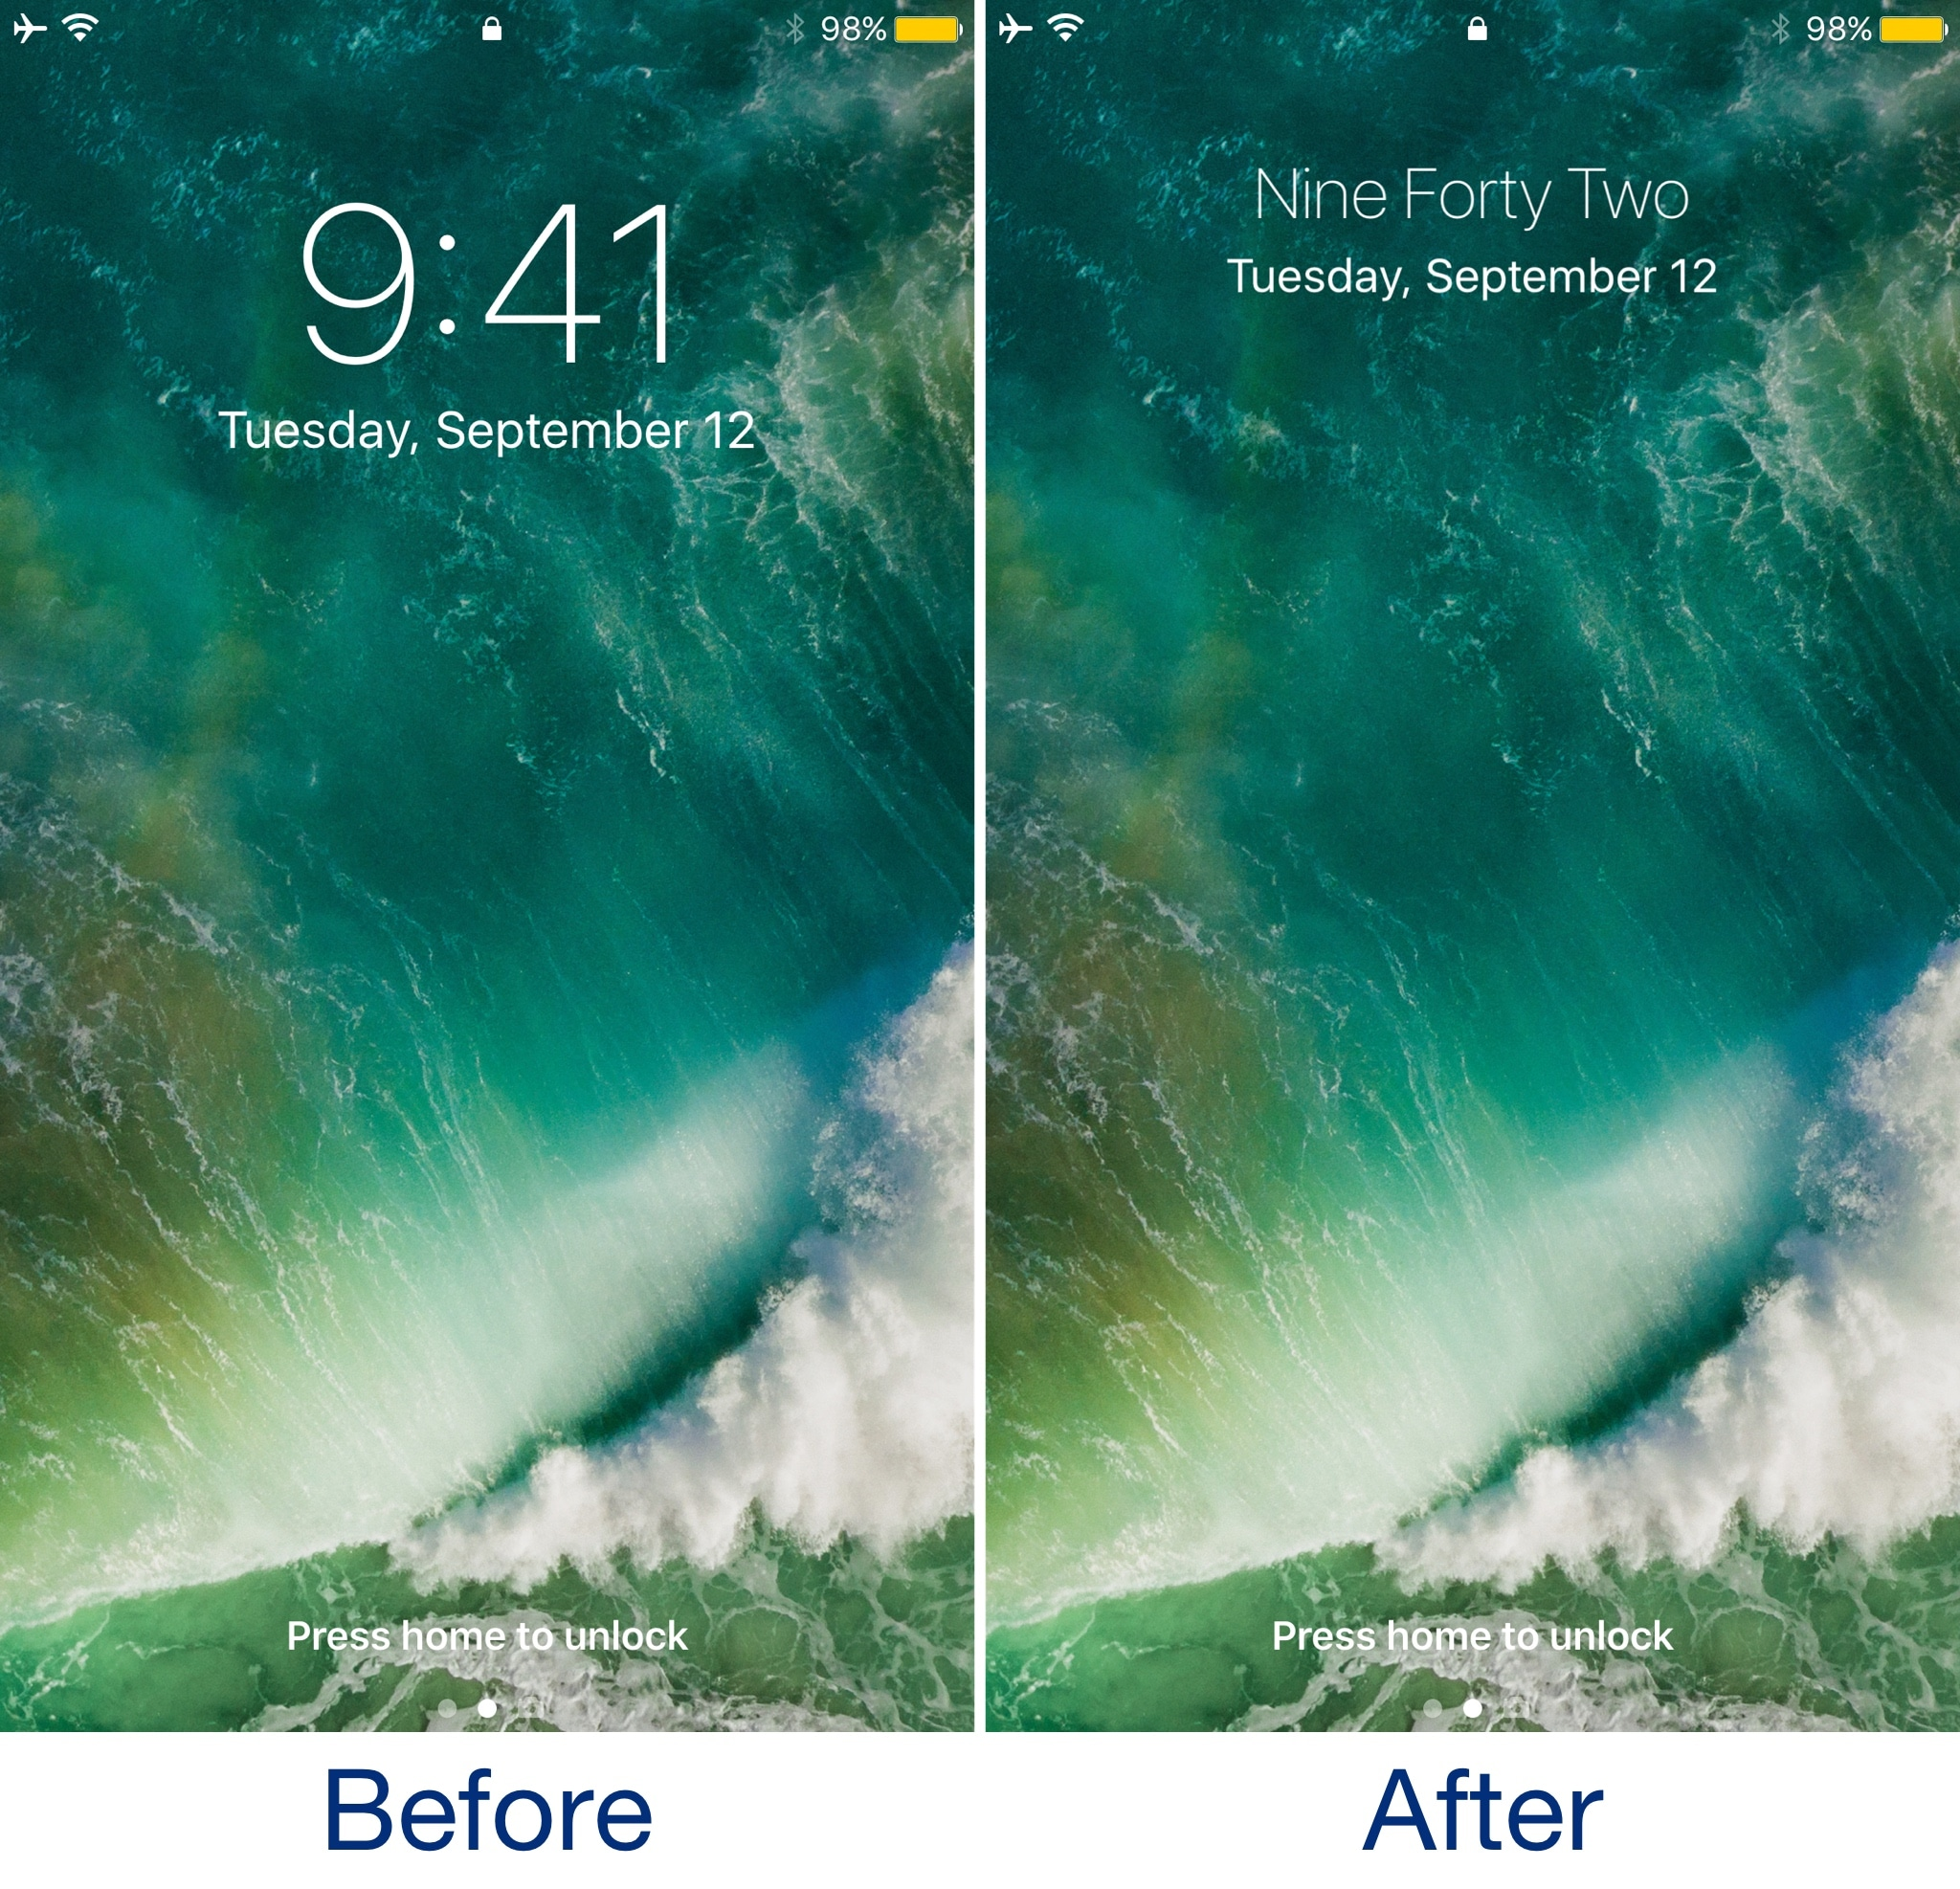 TextyClock replaces the digital clock on your jailbroken